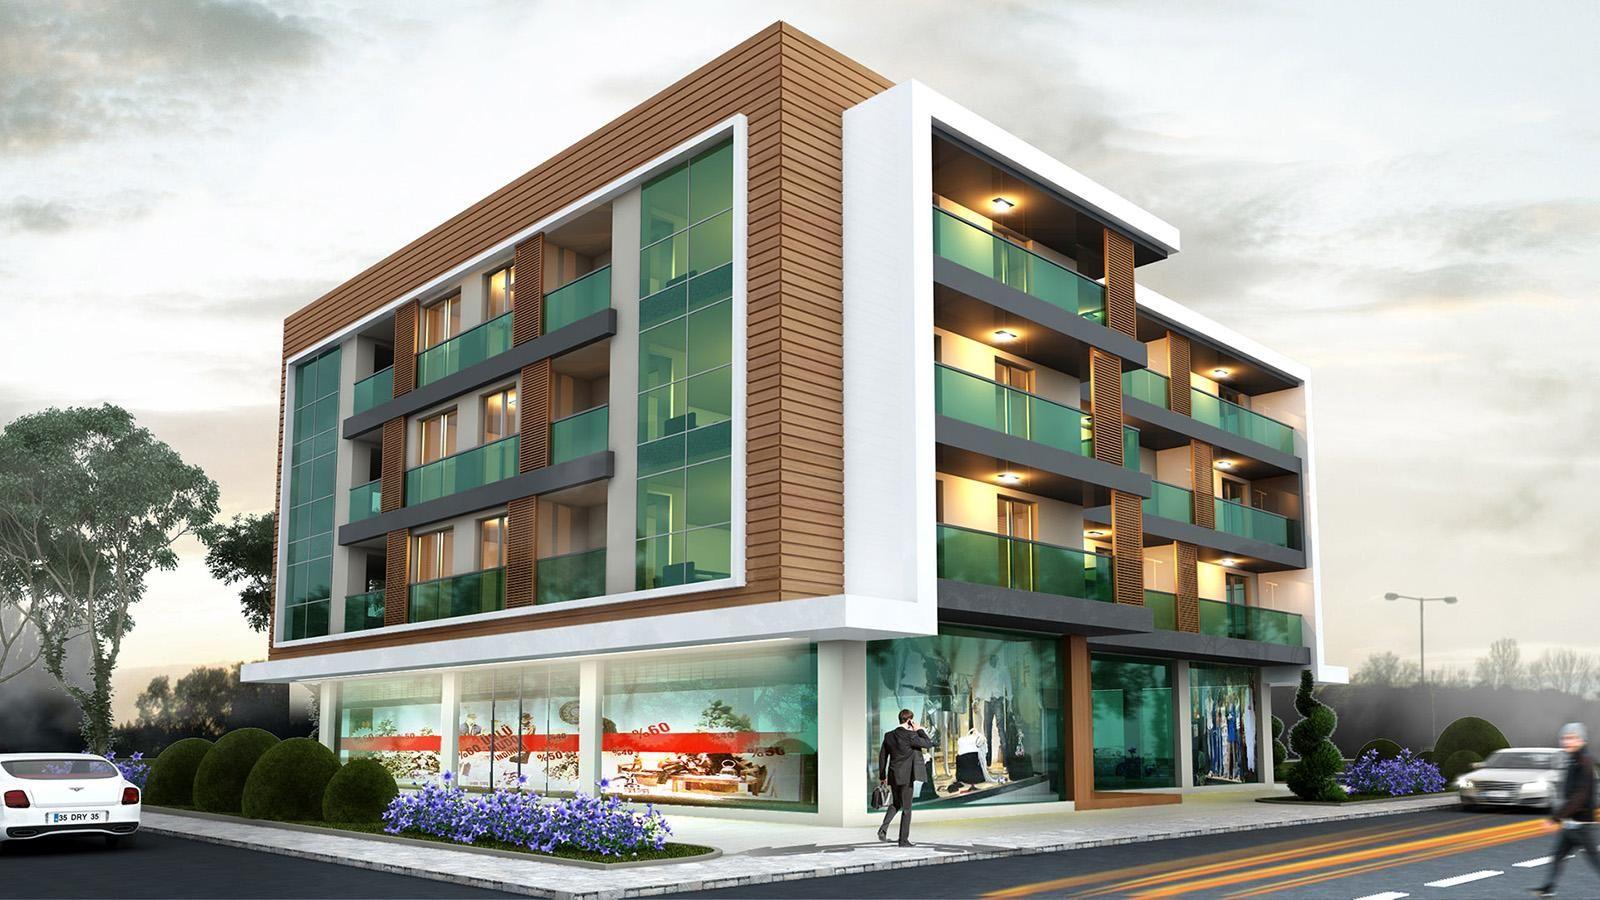 Mimarlik Mimari Dis Cephe Tasarim Building Design